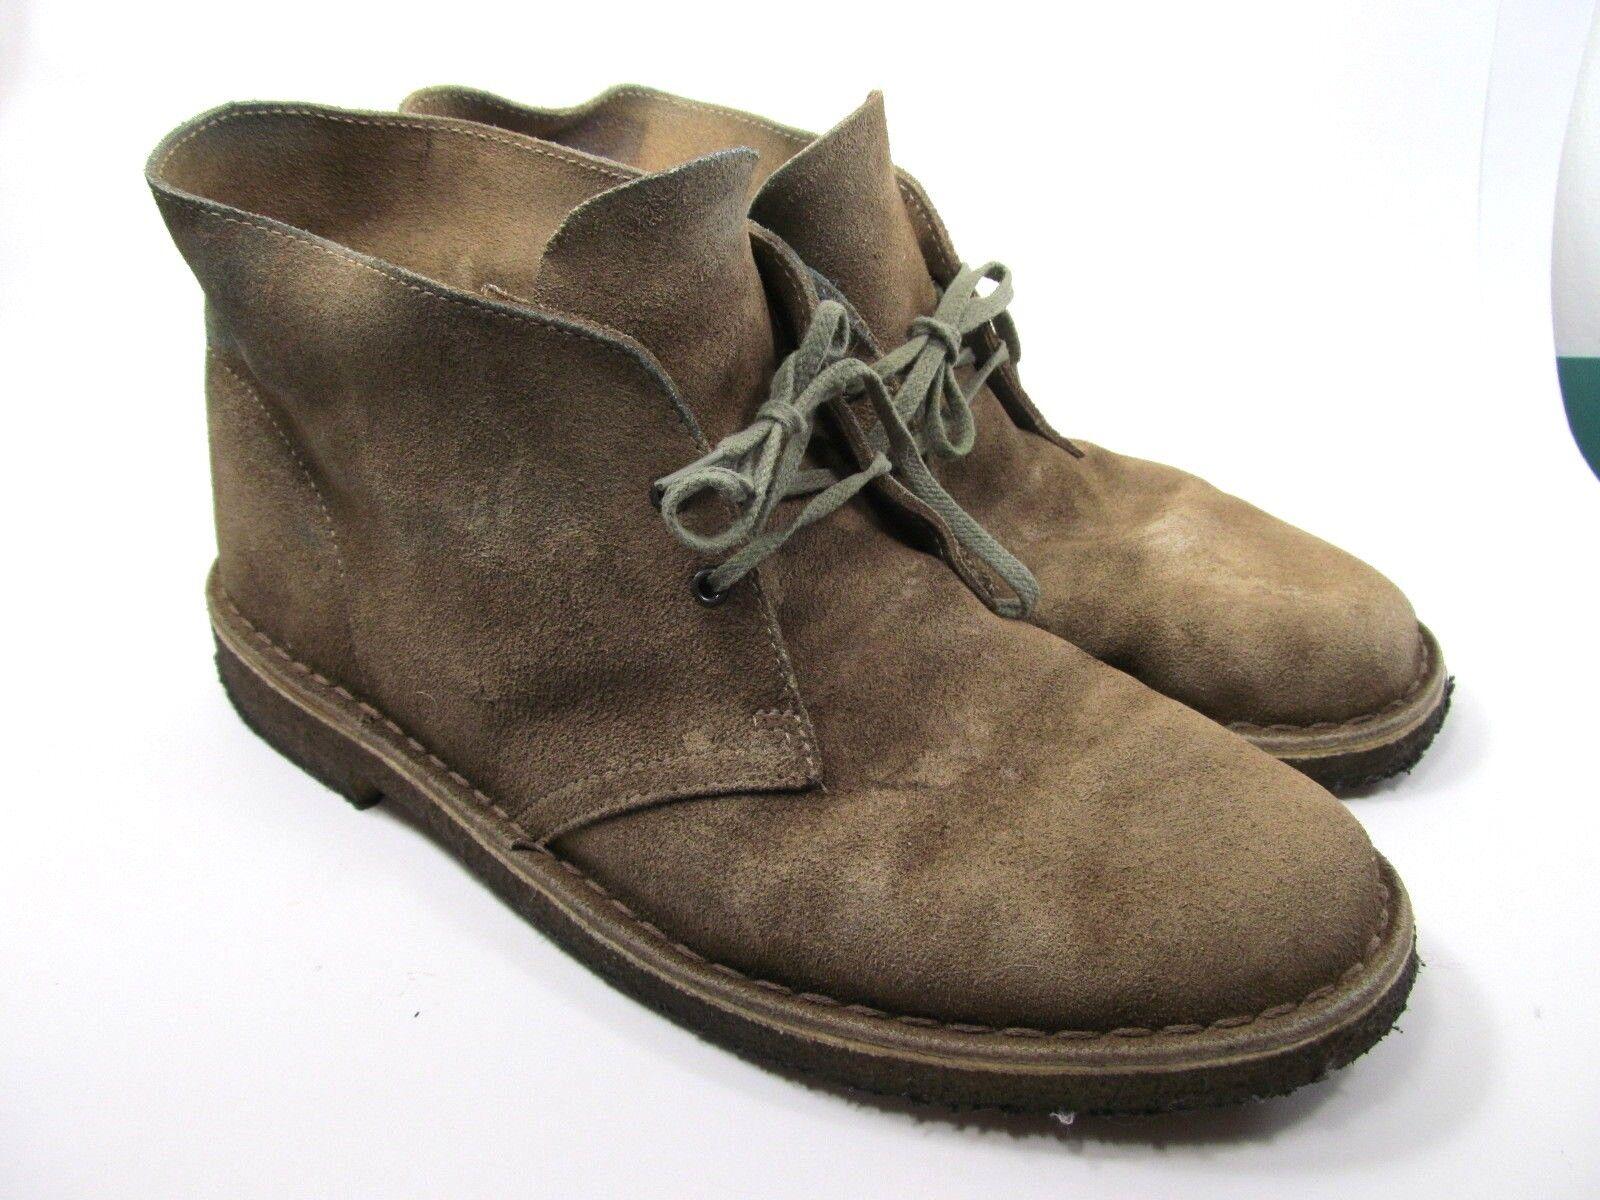 Clarks Originals Desert Chukka Boots shoes Mens Size 11 M